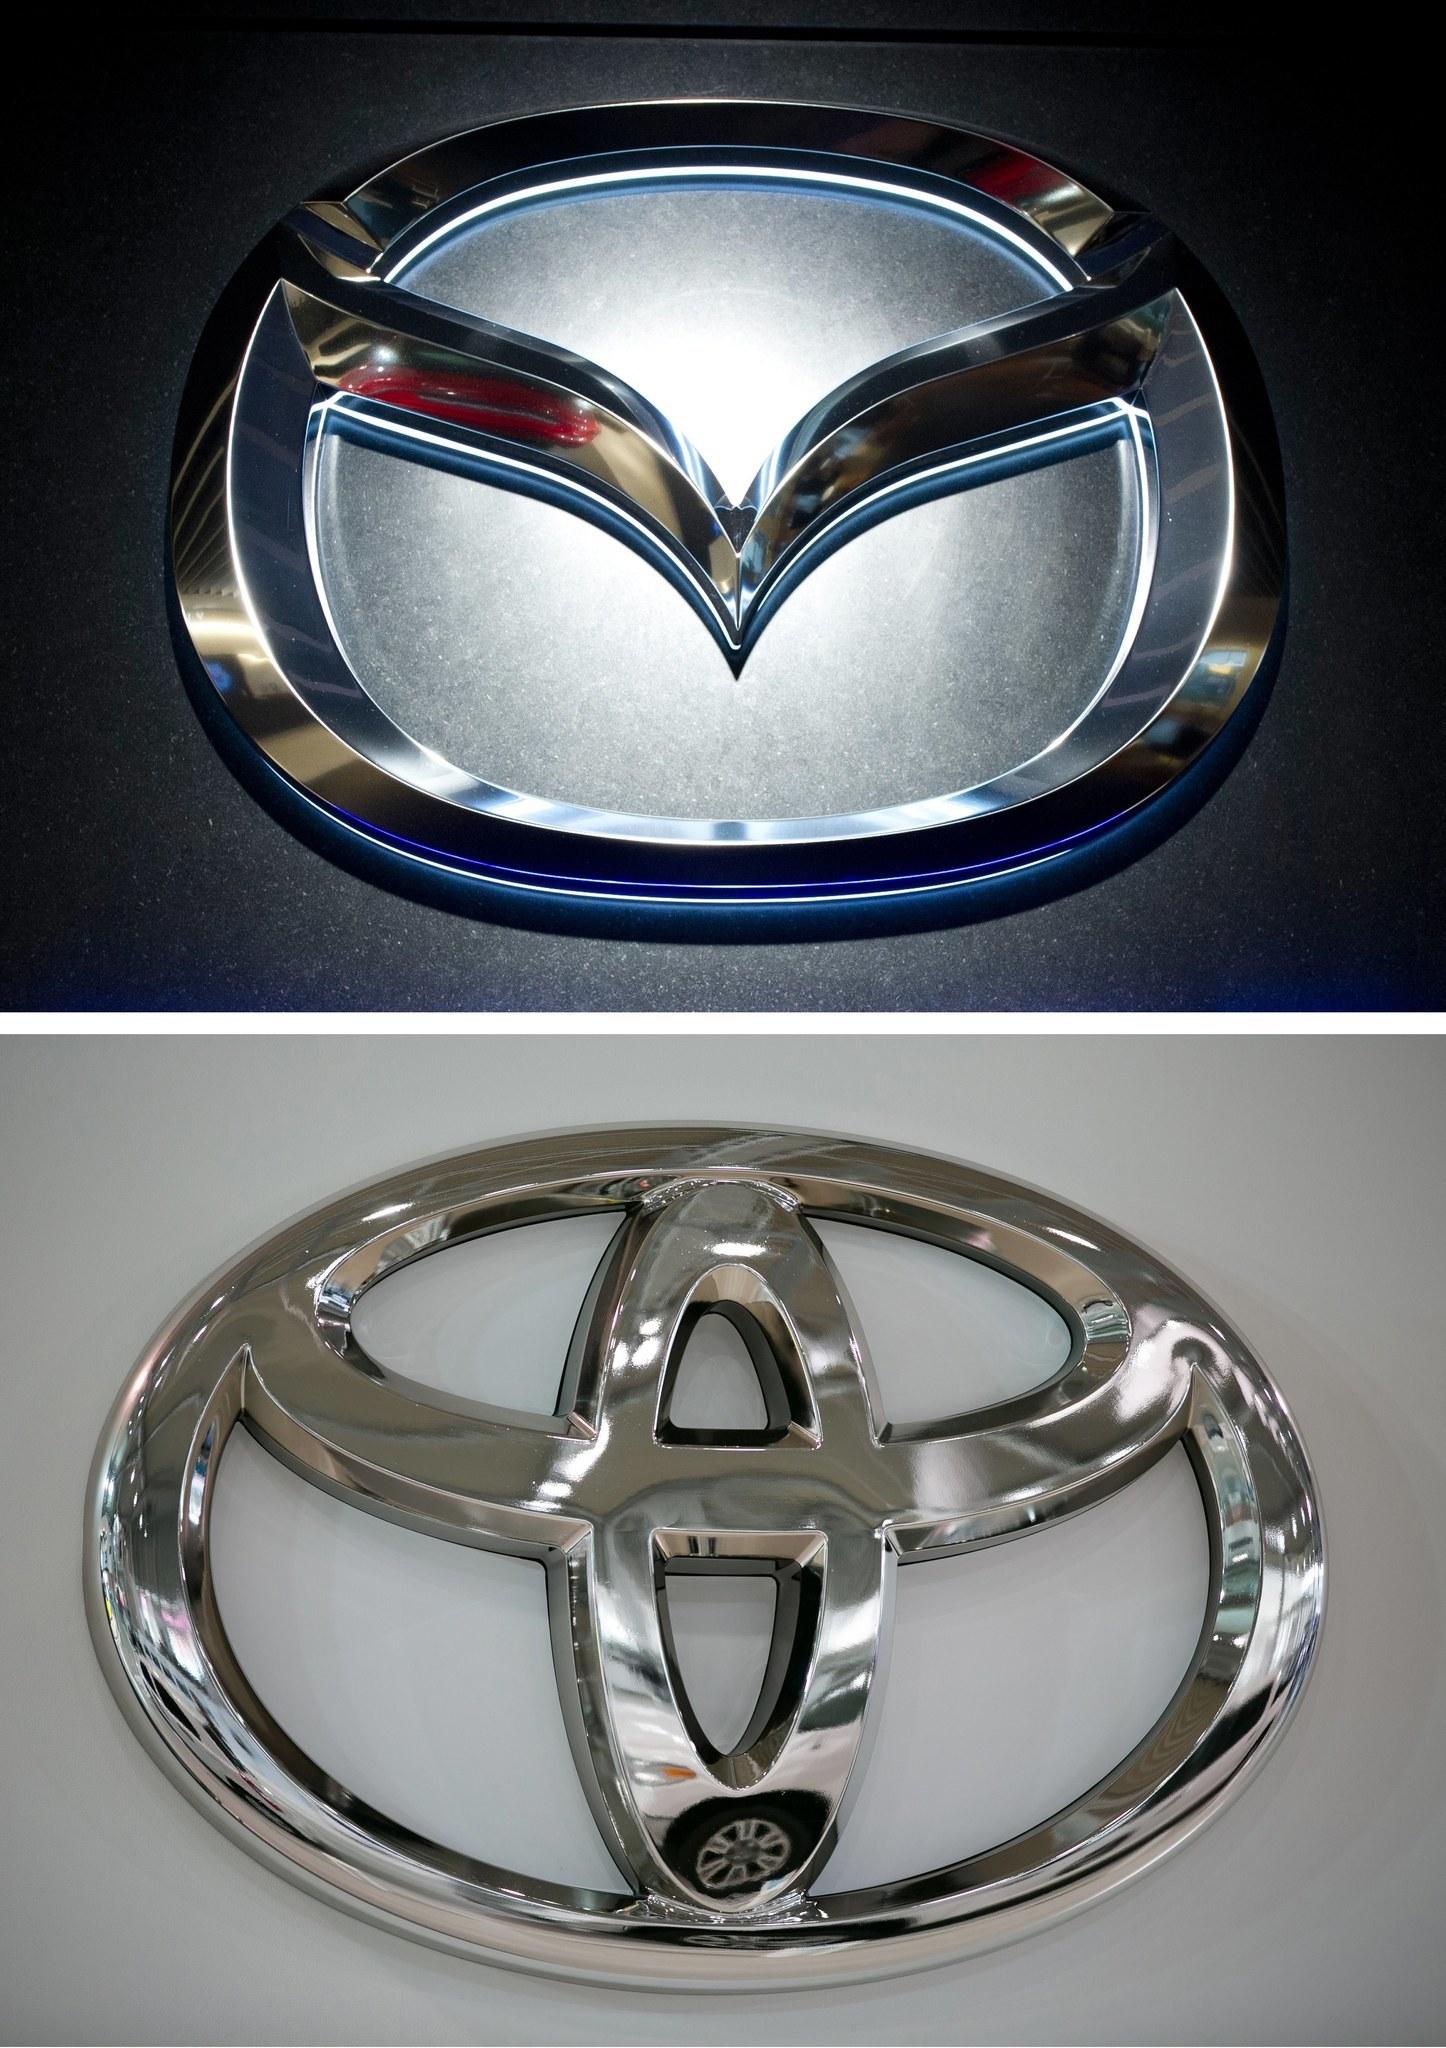 Toyota mazda plan 16 billion us plant to partner in electric toyota mazda plan 16 billion us plant to partner in electric vehicles chicago tribune biocorpaavc Choice Image